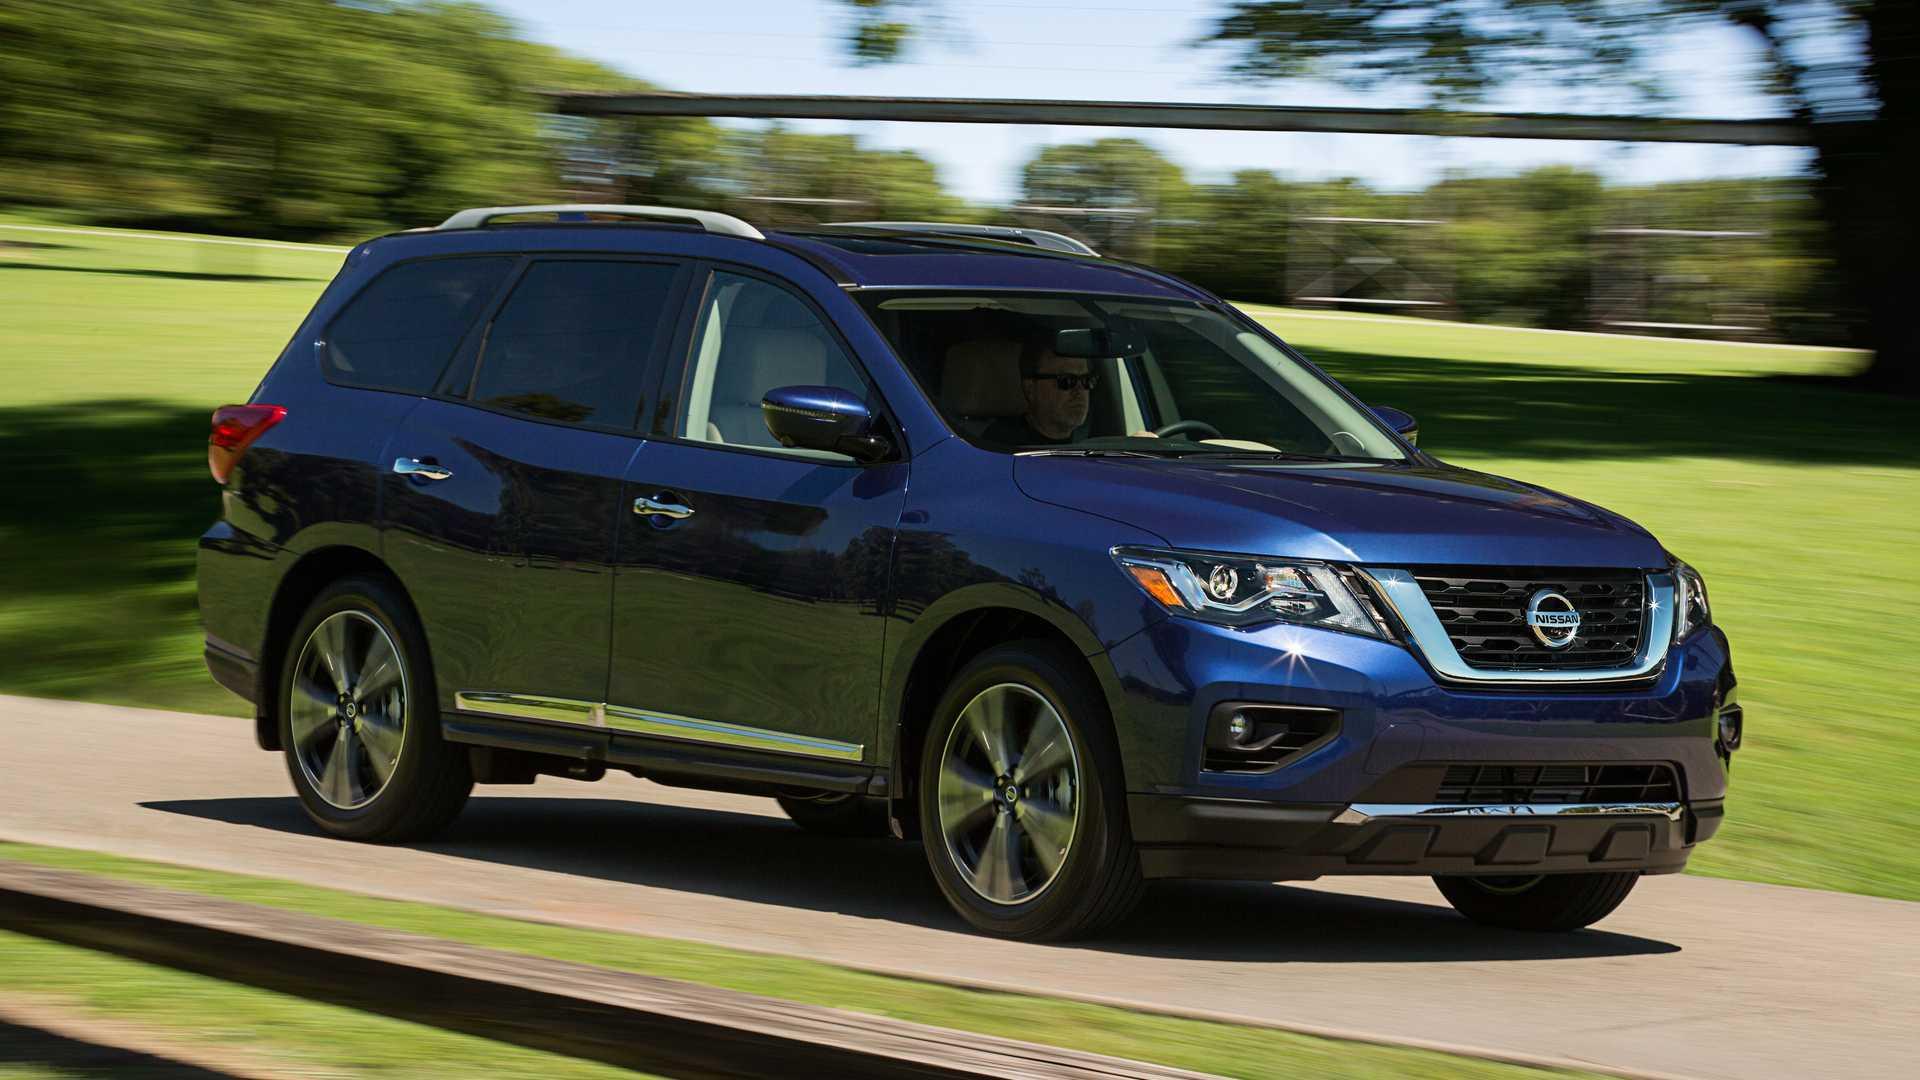 2020 Nissan Pathfinder Lineup Gets Minor Price Increase